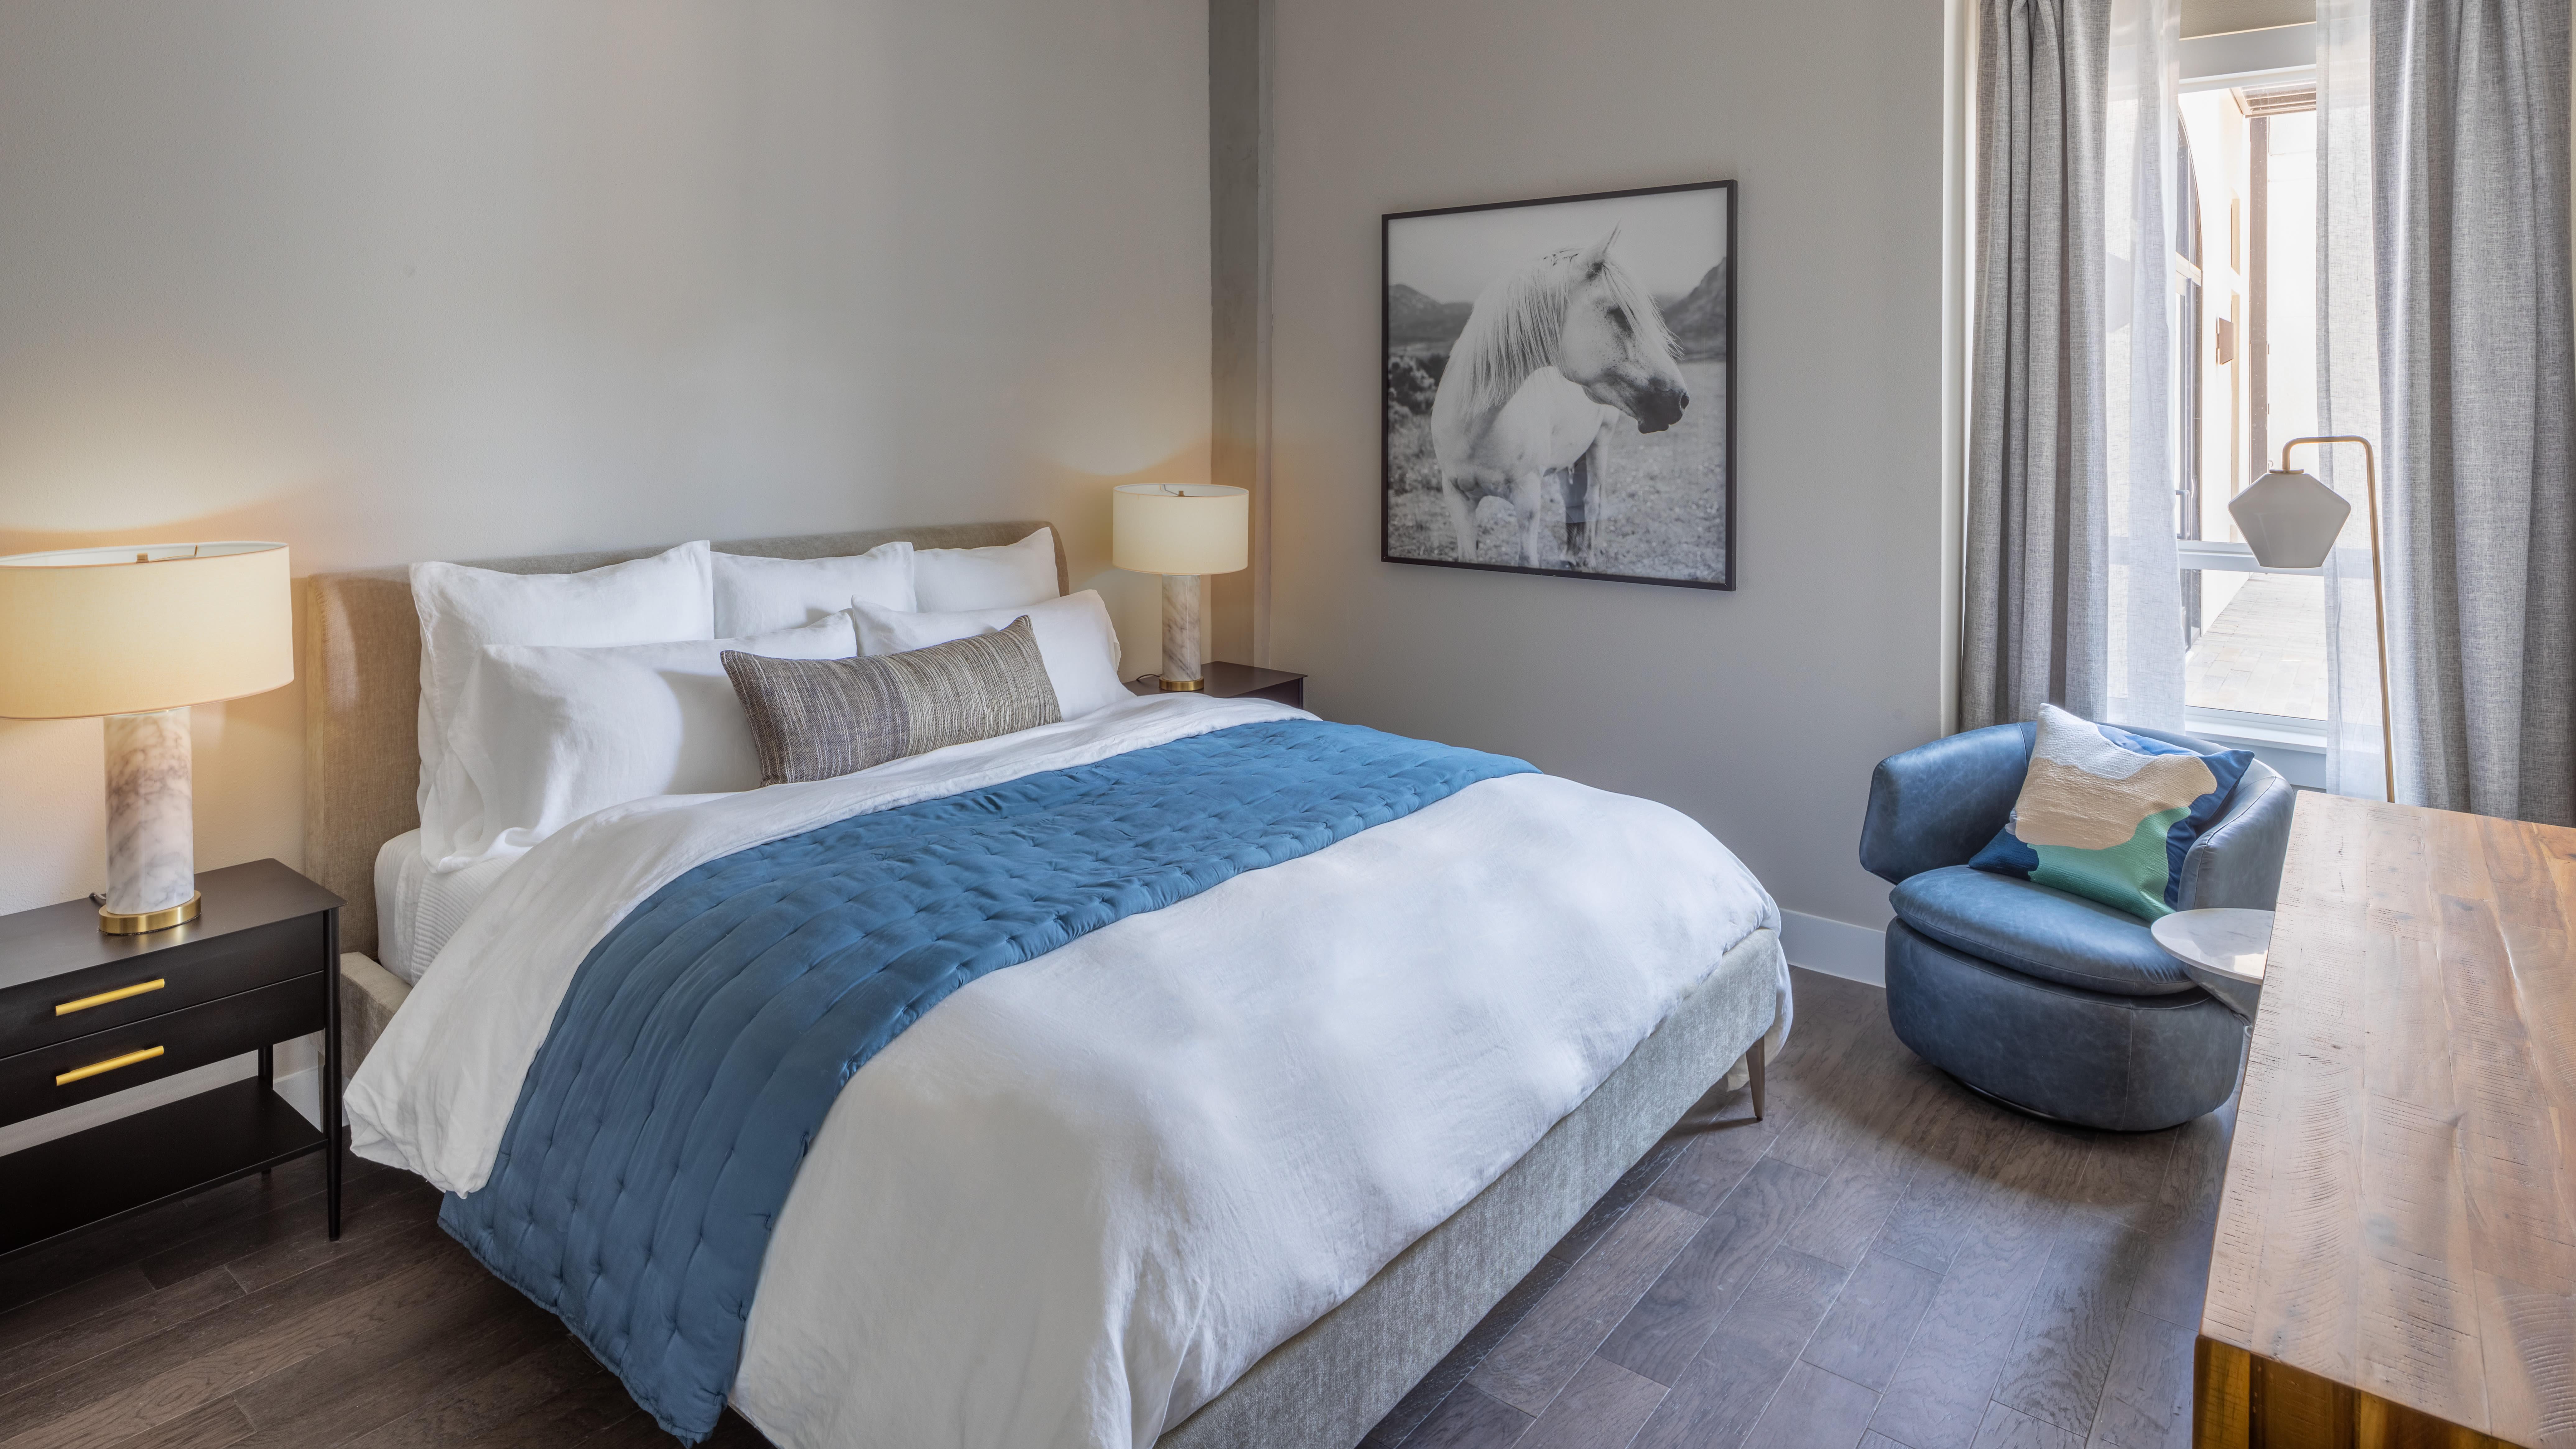 Relaxing bedroom with wood floors at Magnolia Heights in San Antonio, Texas